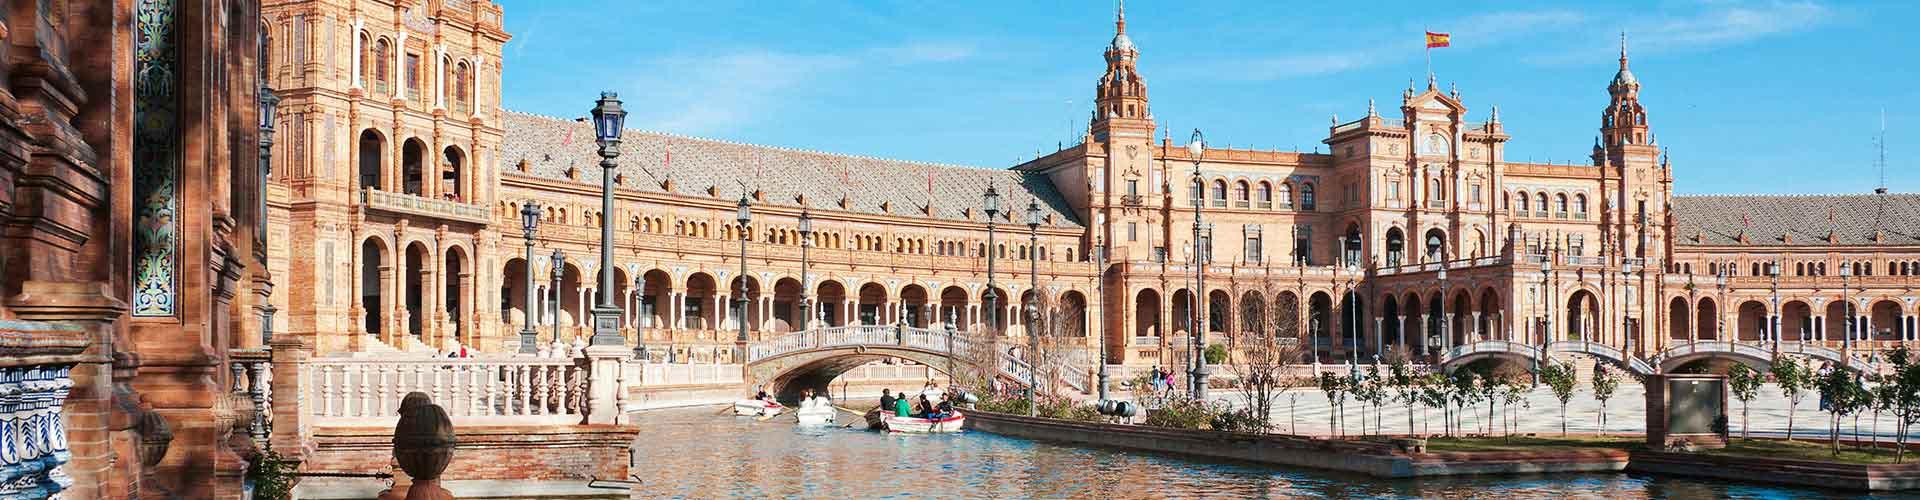 Sevilla - Hoteles baratos cerca a Plaza de Toros. Mapas de Sevilla, Fotos y comentarios de cada Hotel en Sevilla.